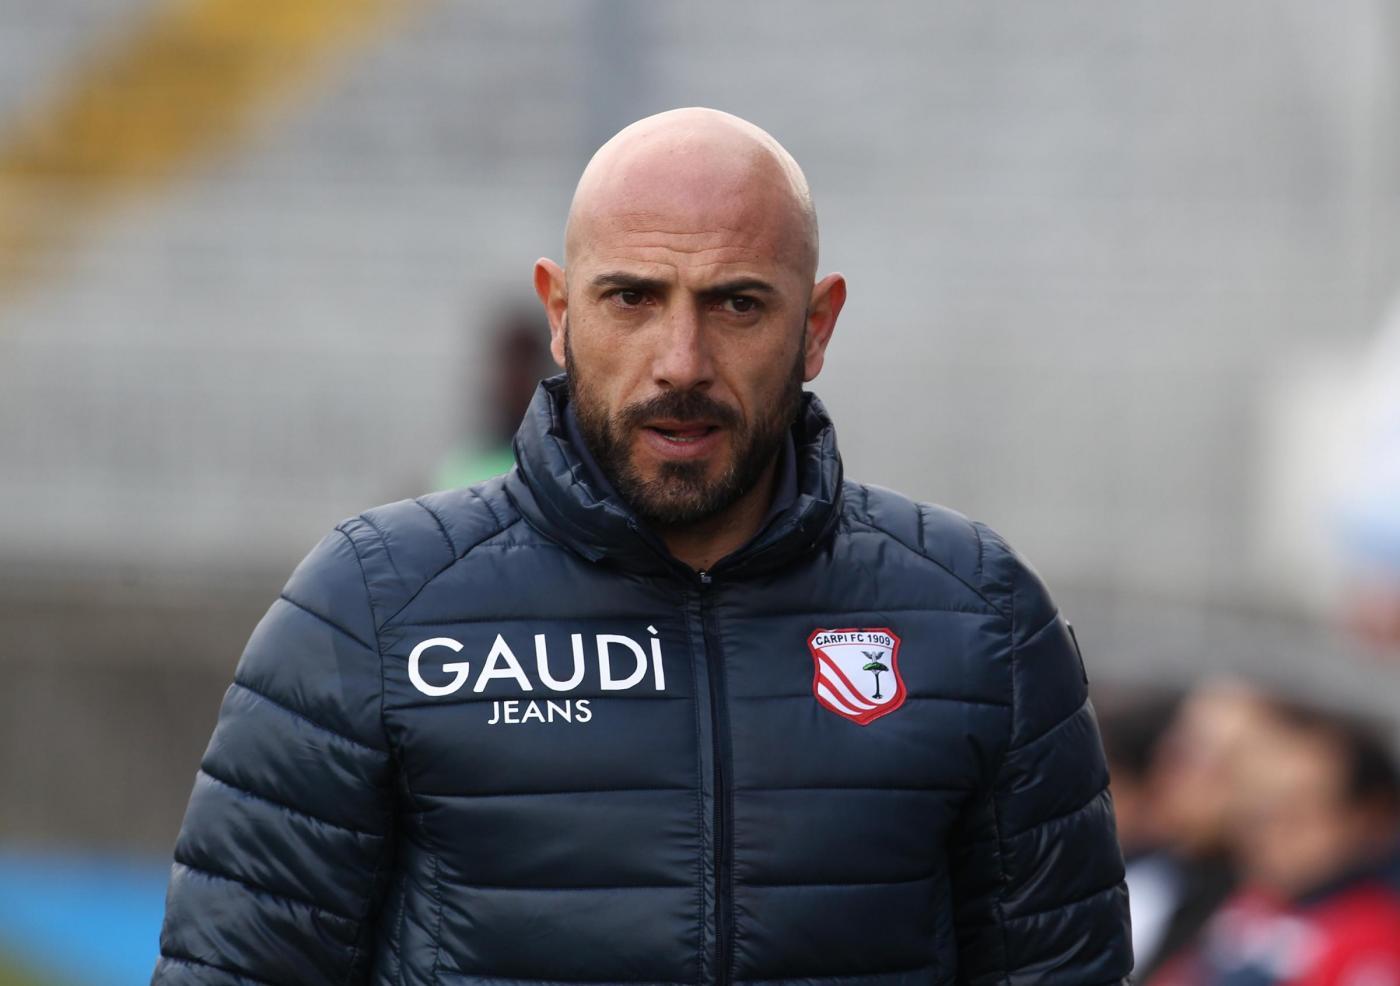 Serie C Girone C, Viterbese-Cavese pronostico: nuovo cambio in panchina per i gialloblù